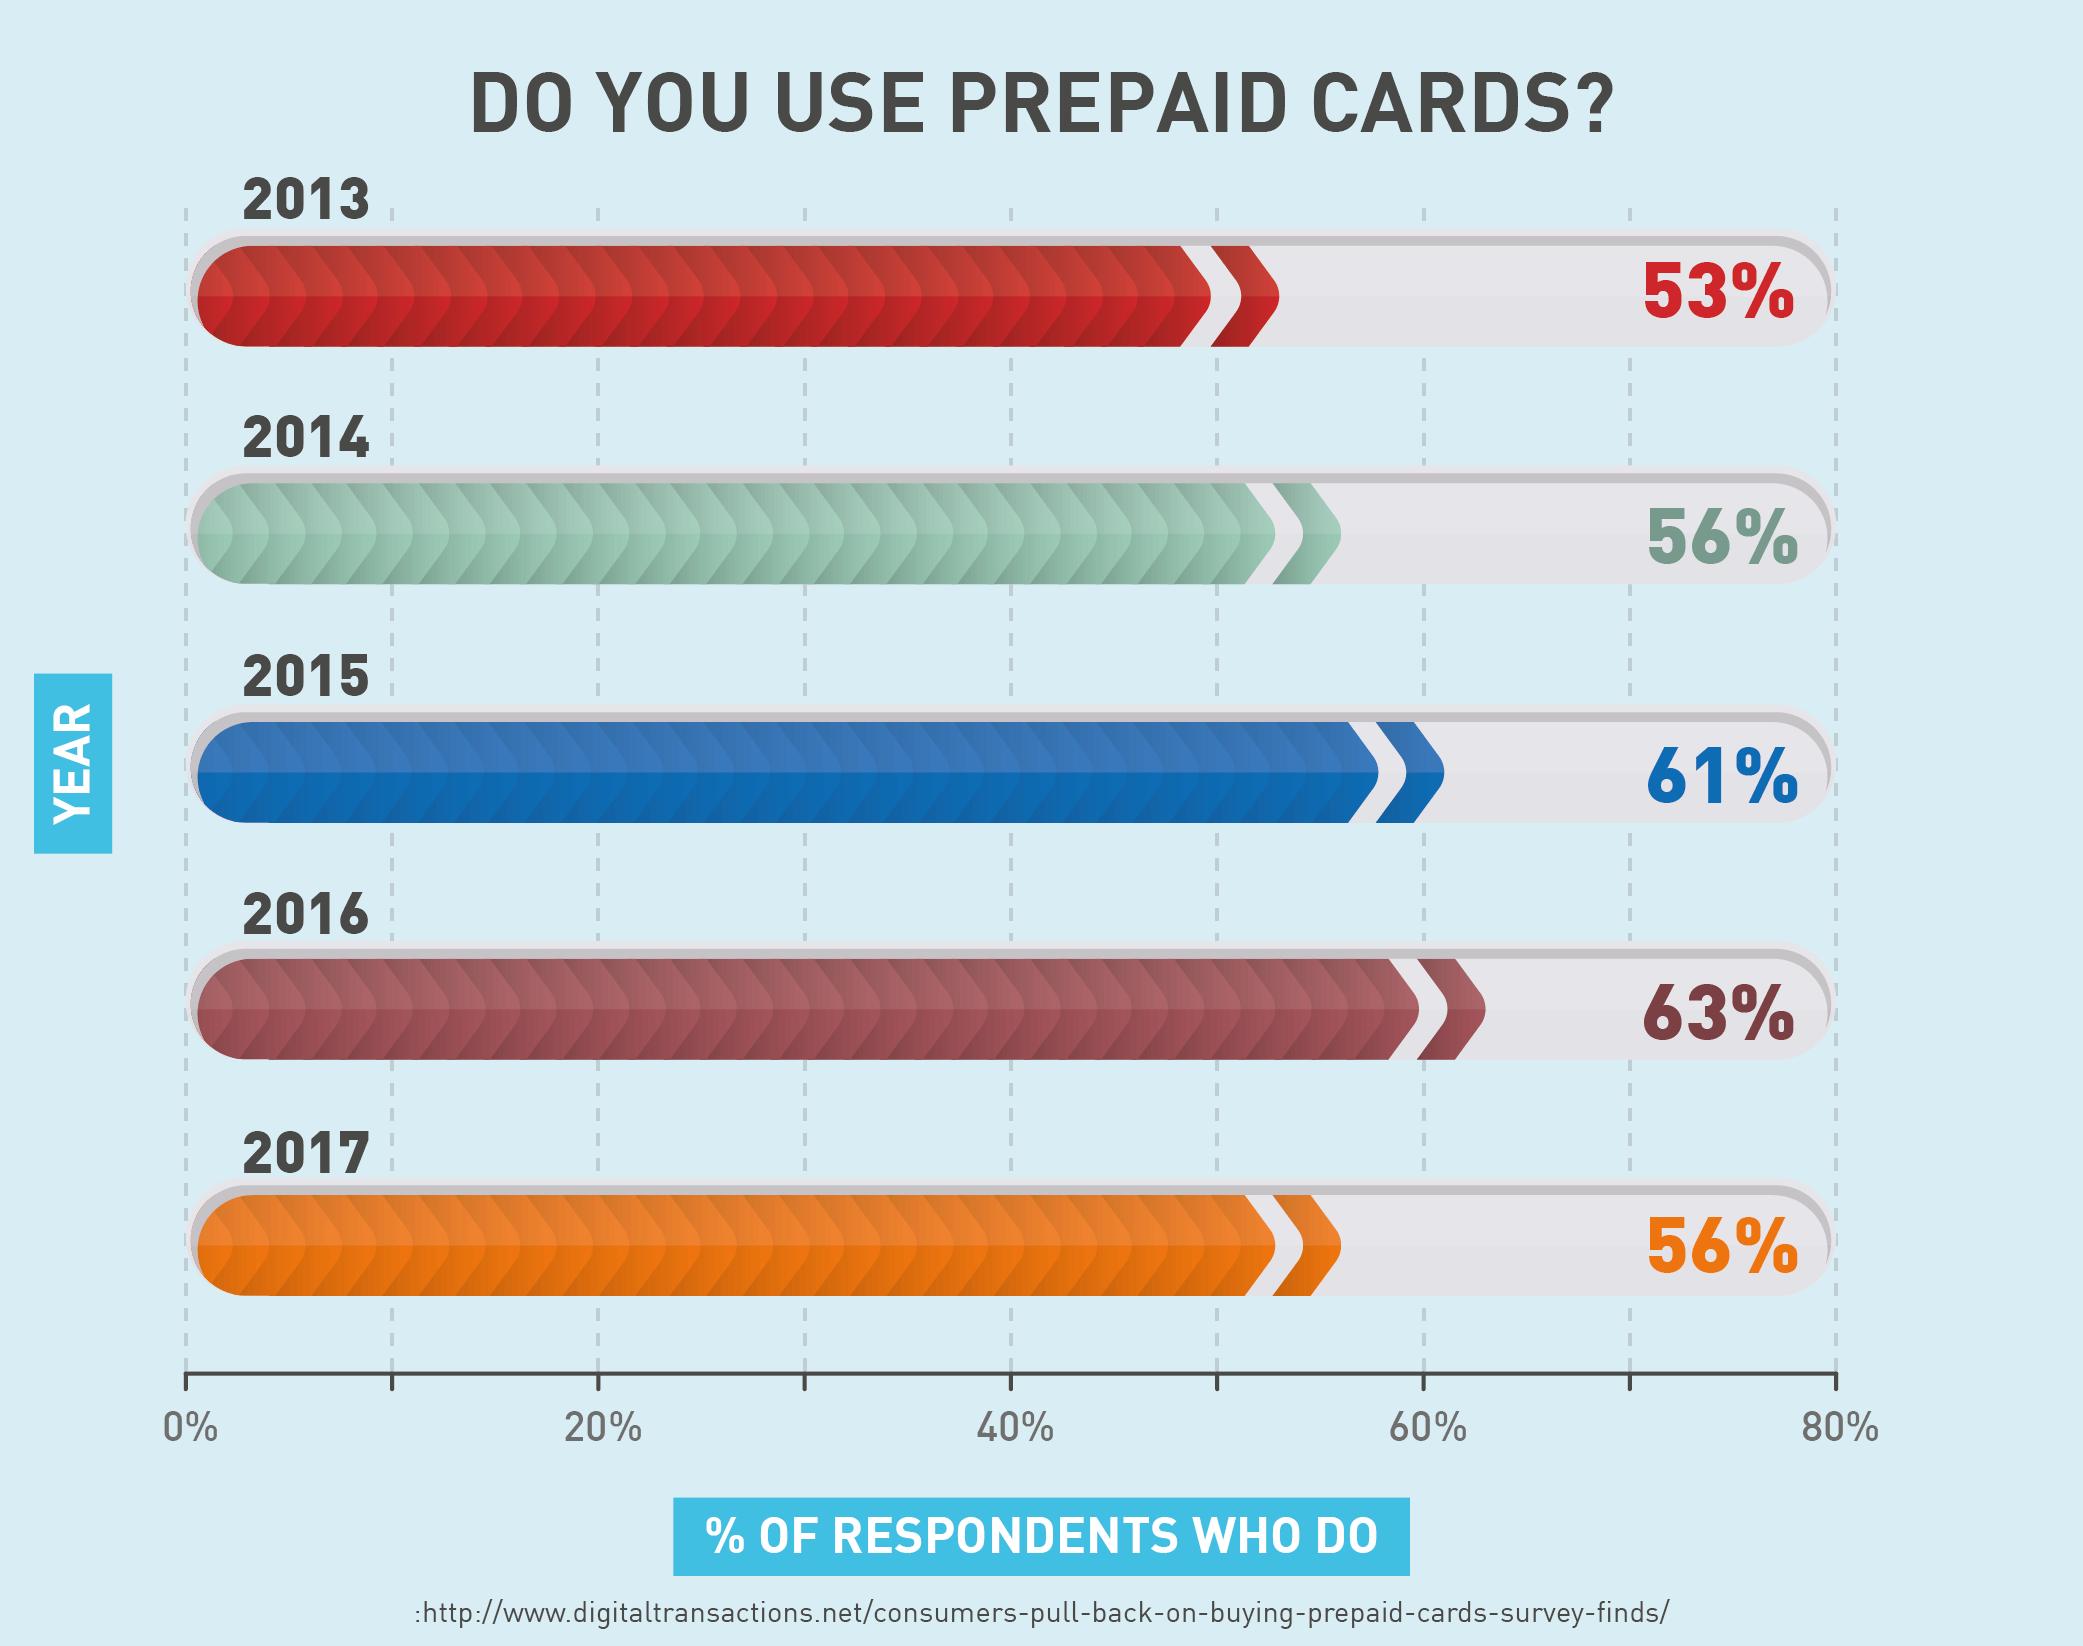 Do you use prepaid cards?